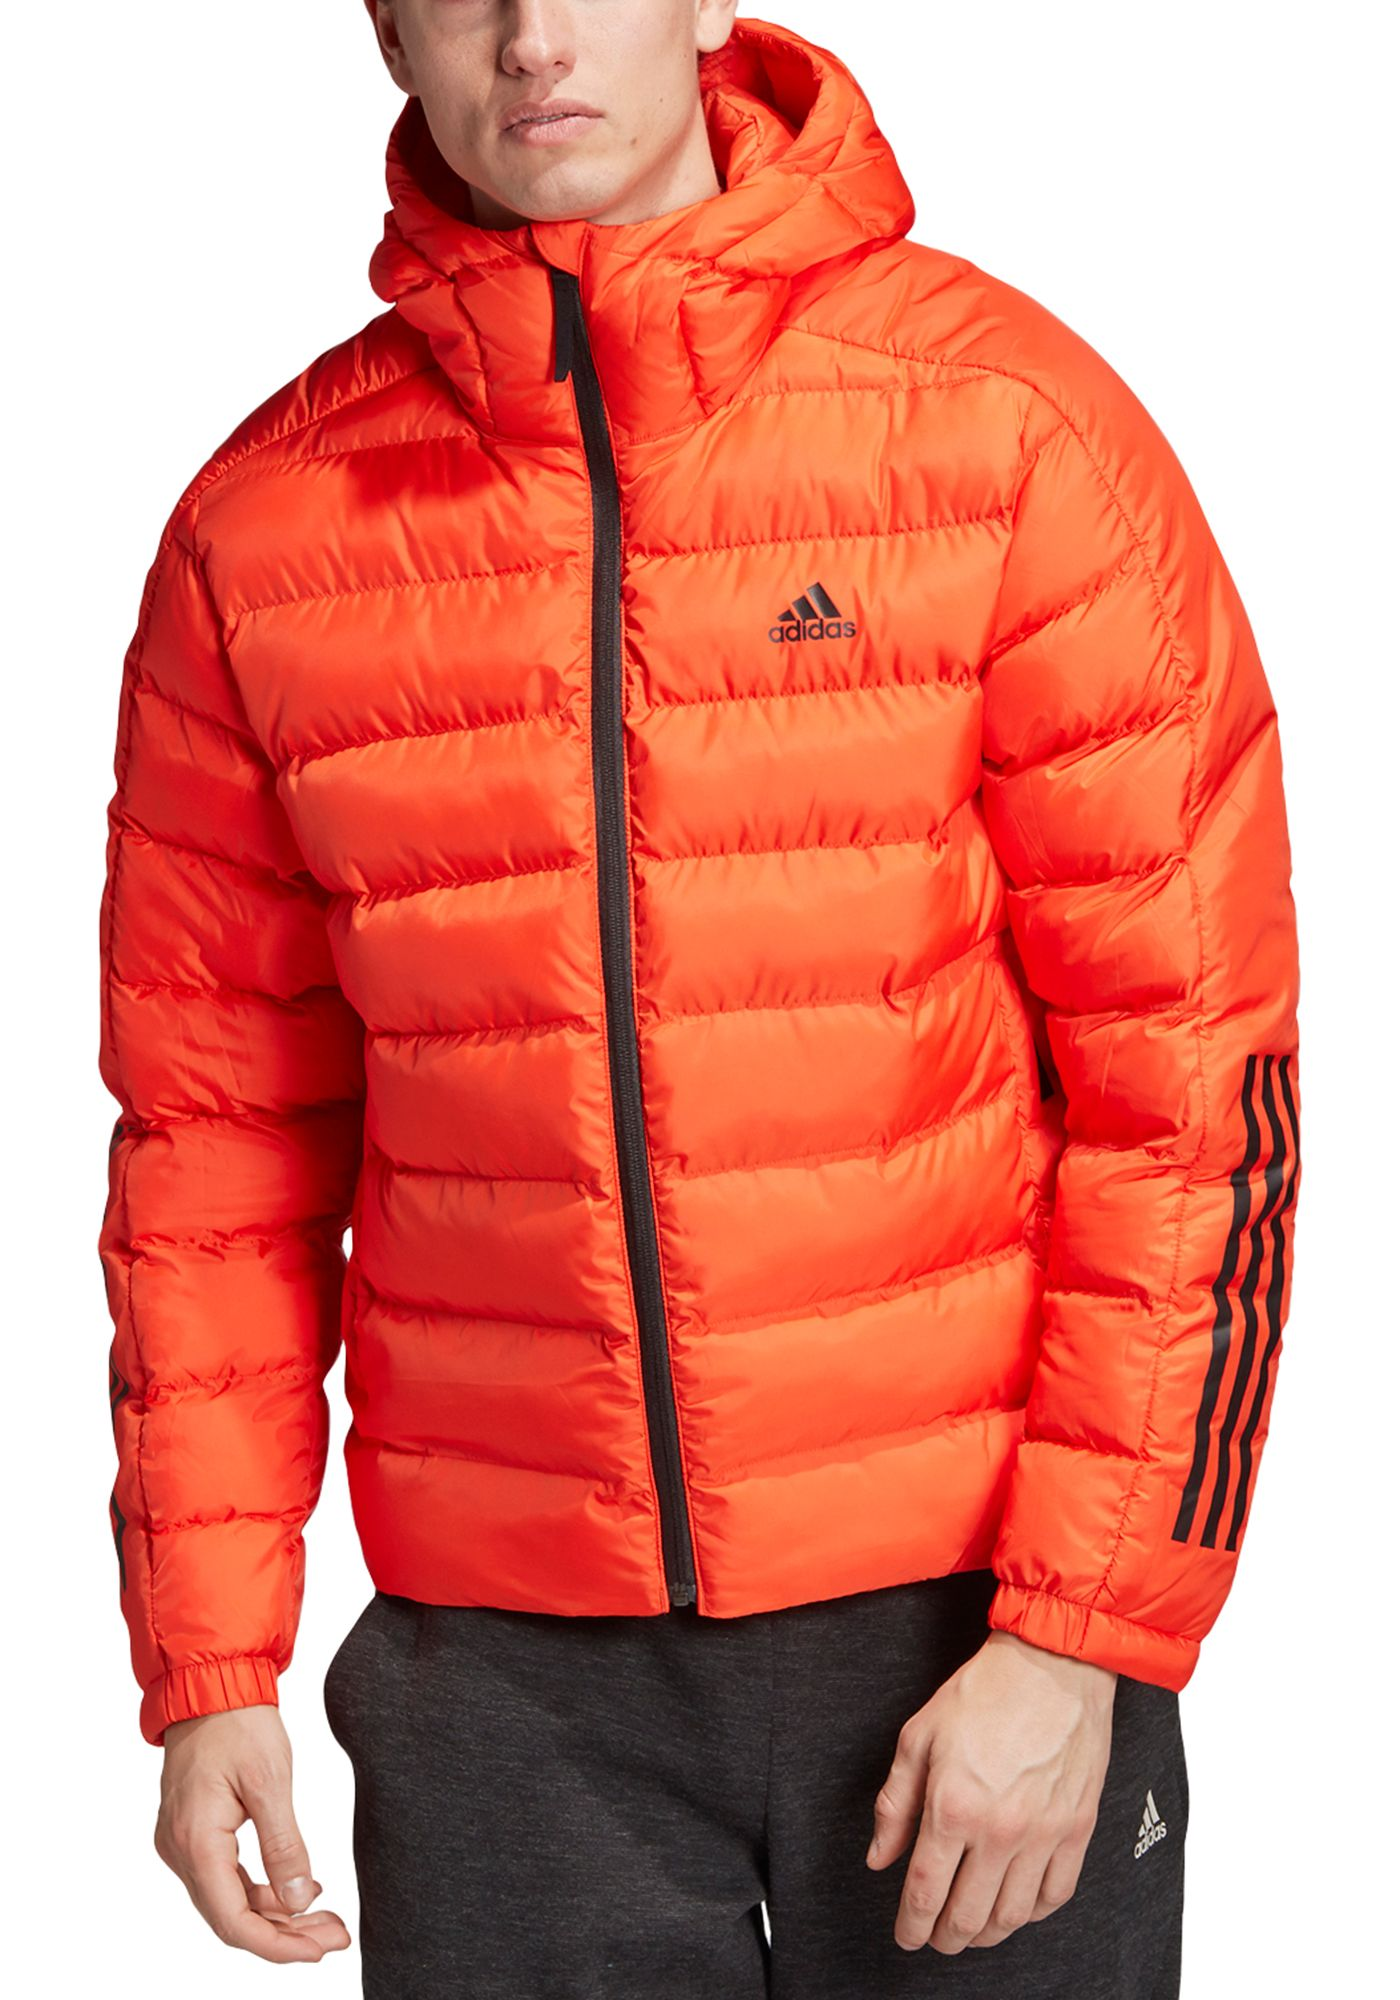 adidas Men's Itavic 3-Stripes Jacket 2.0